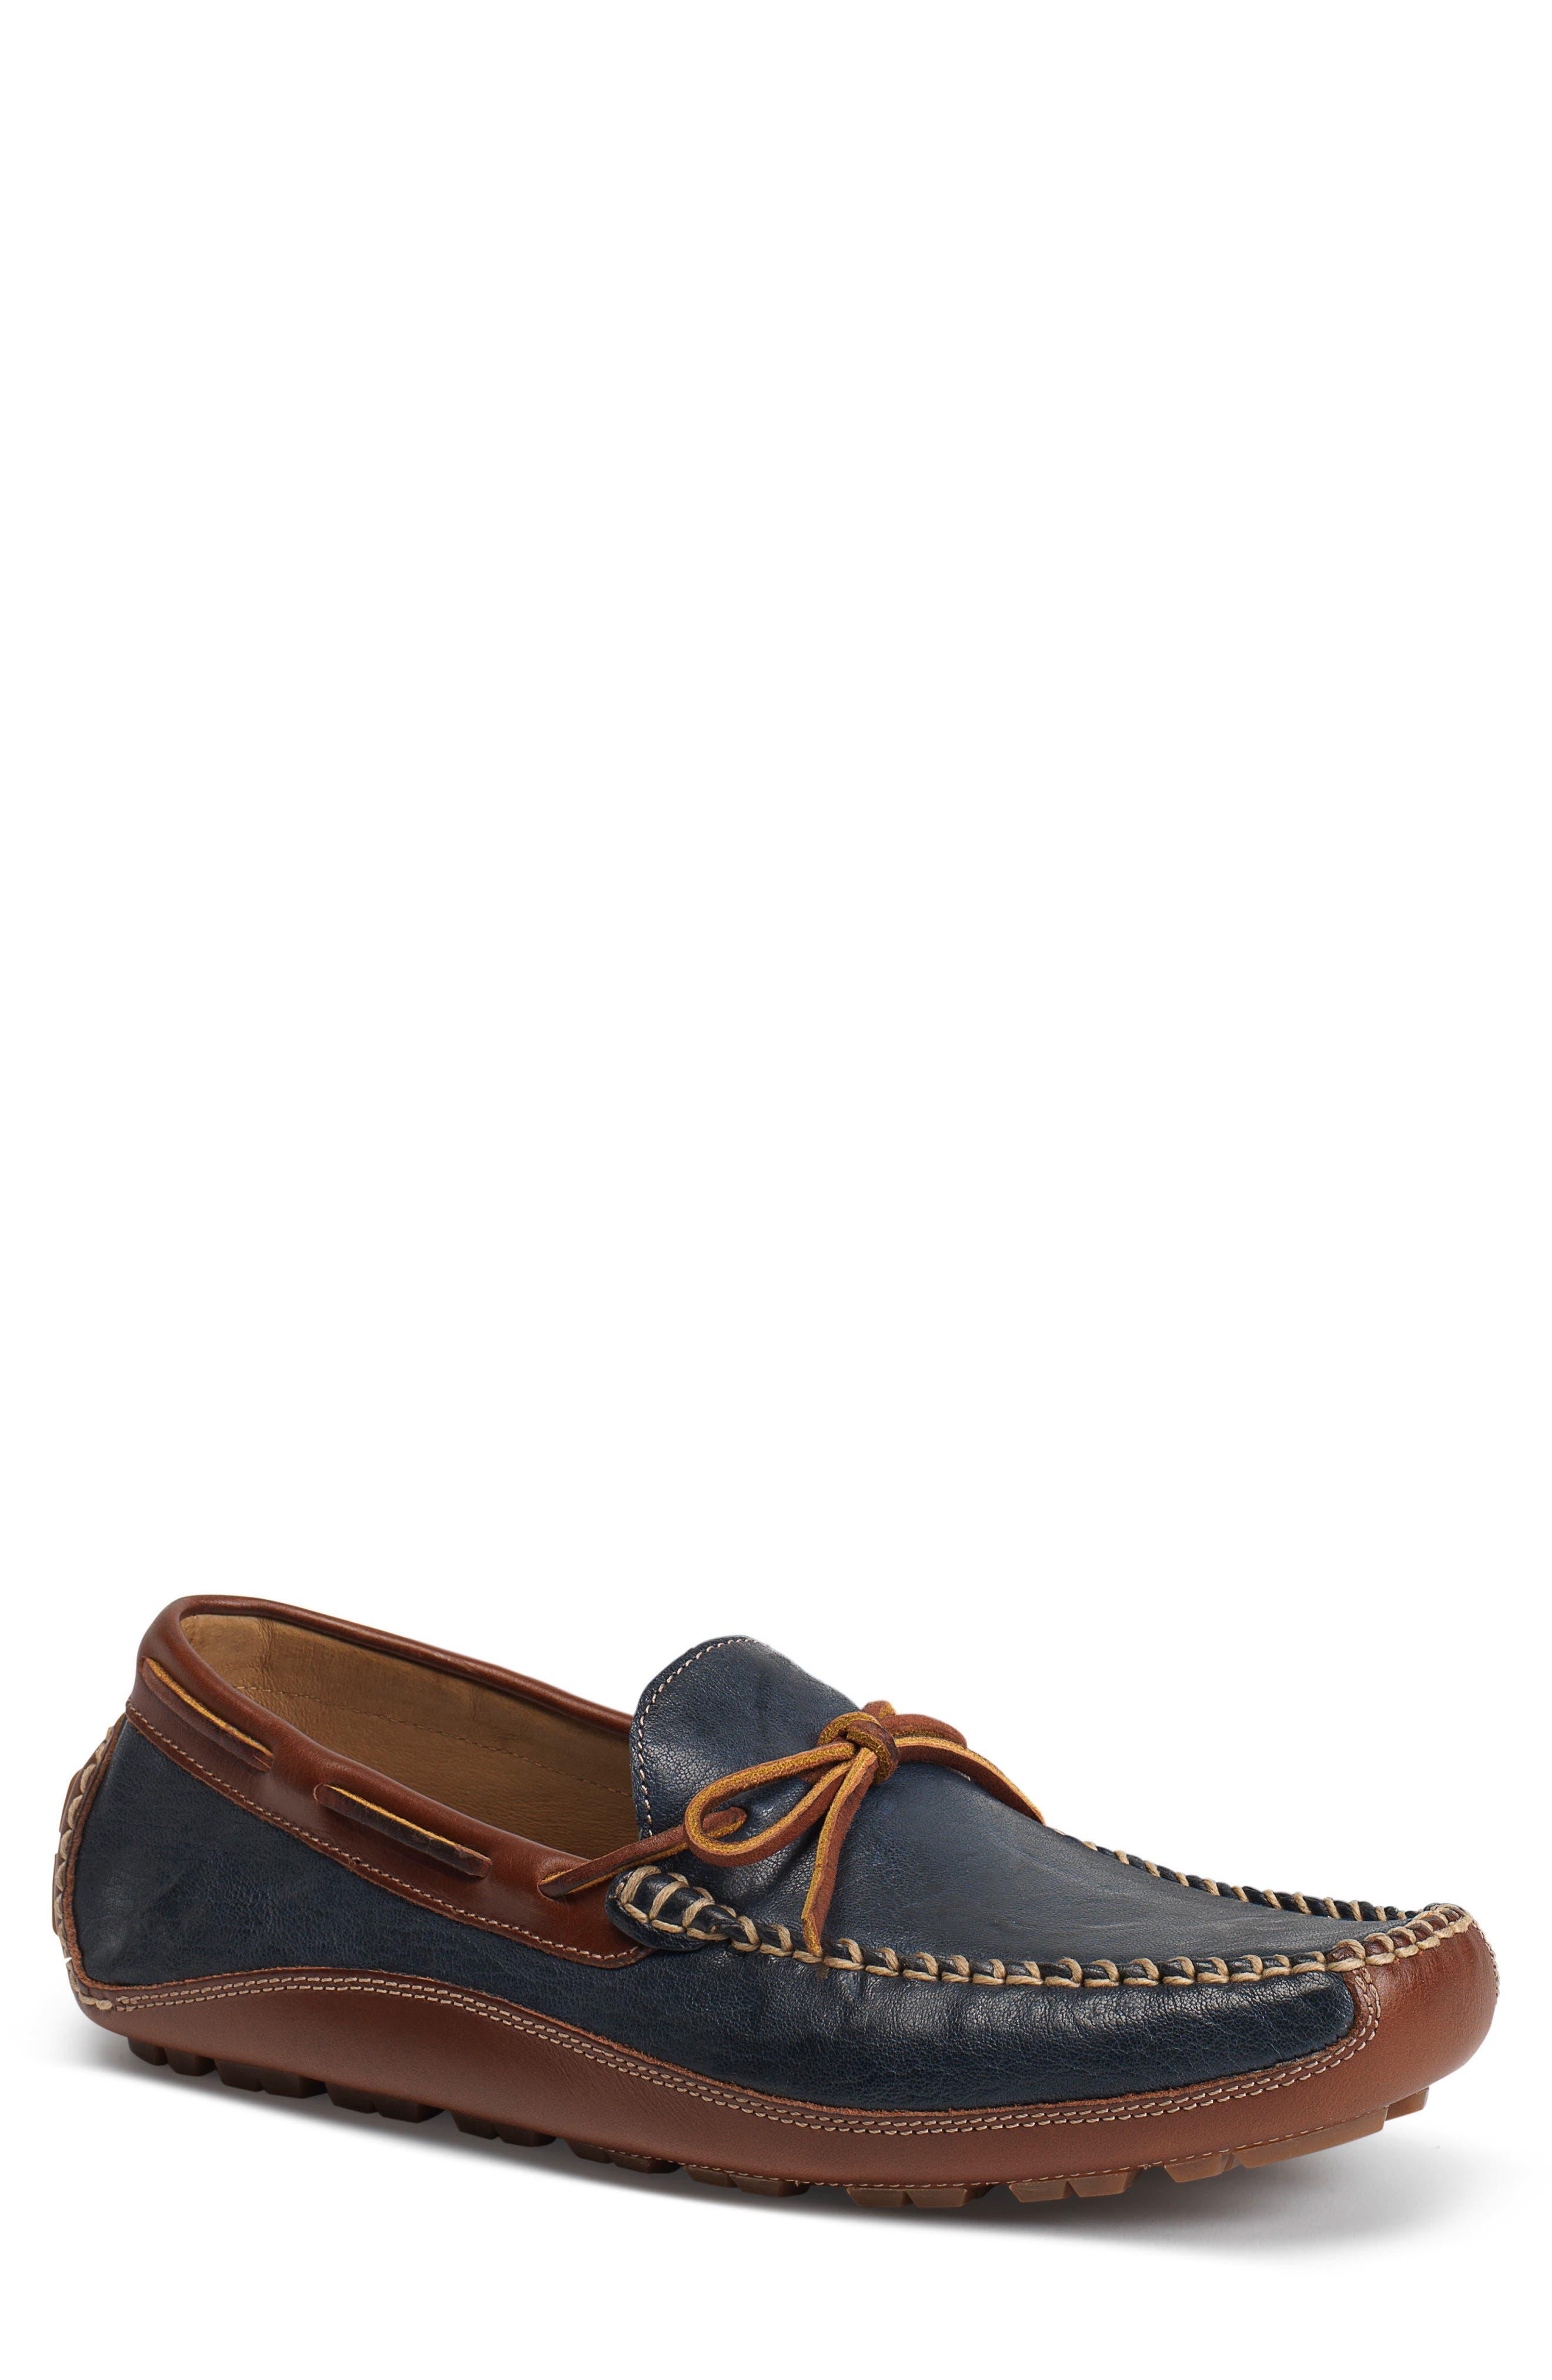 'Drake' Leather Driving Shoe,                             Main thumbnail 12, color,